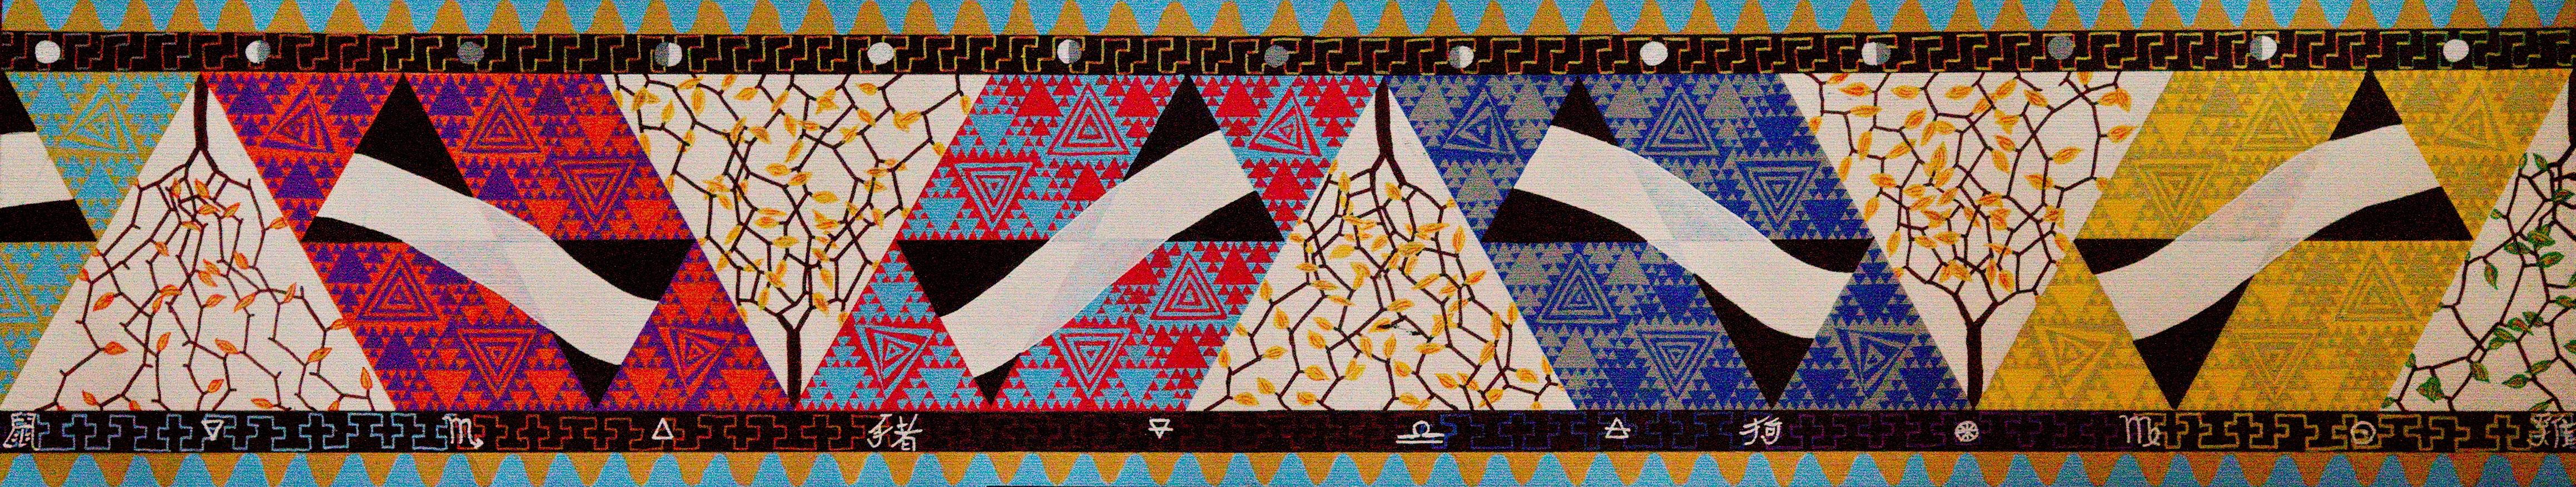 Herfst deel Möbiusband - acryl op papier - 91,25 x 19 cm